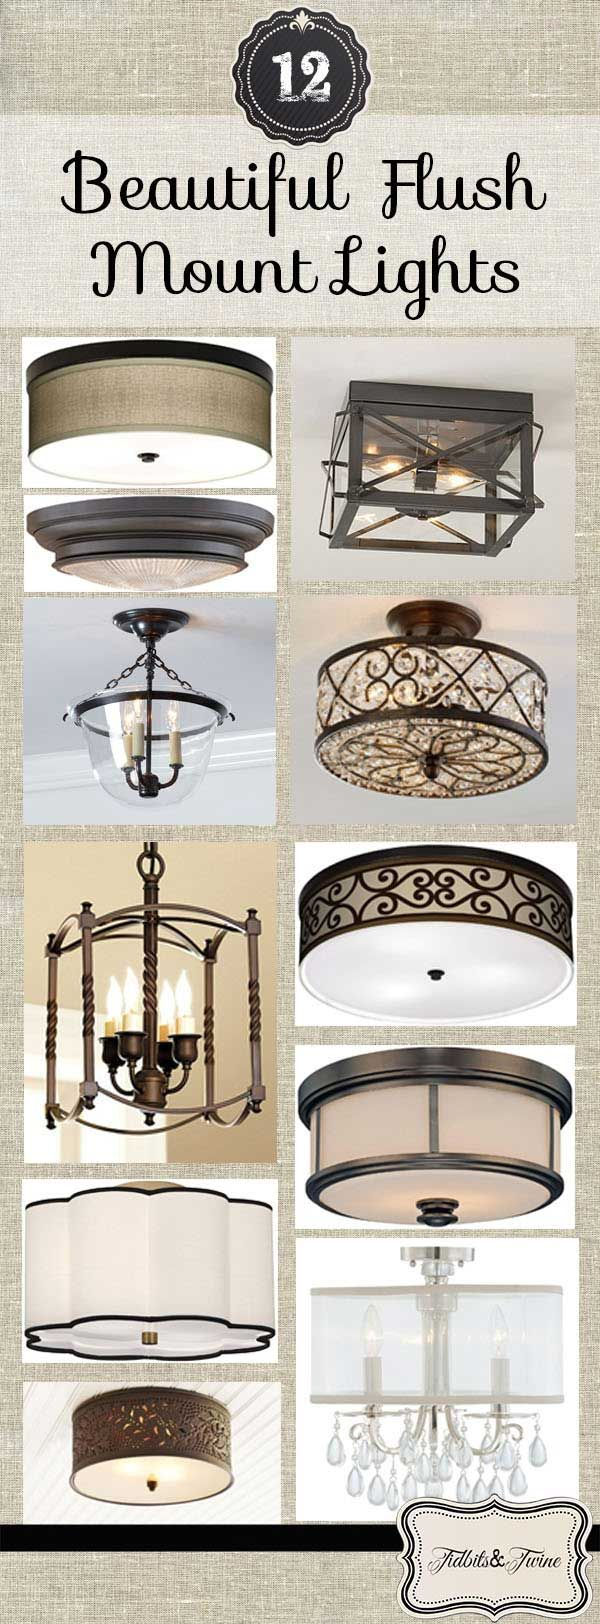 12 beautiful flush mount ceiling lights black trim ceiling lights 12 beautiful flush mount ceiling lights tidbitstwine arubaitofo Choice Image